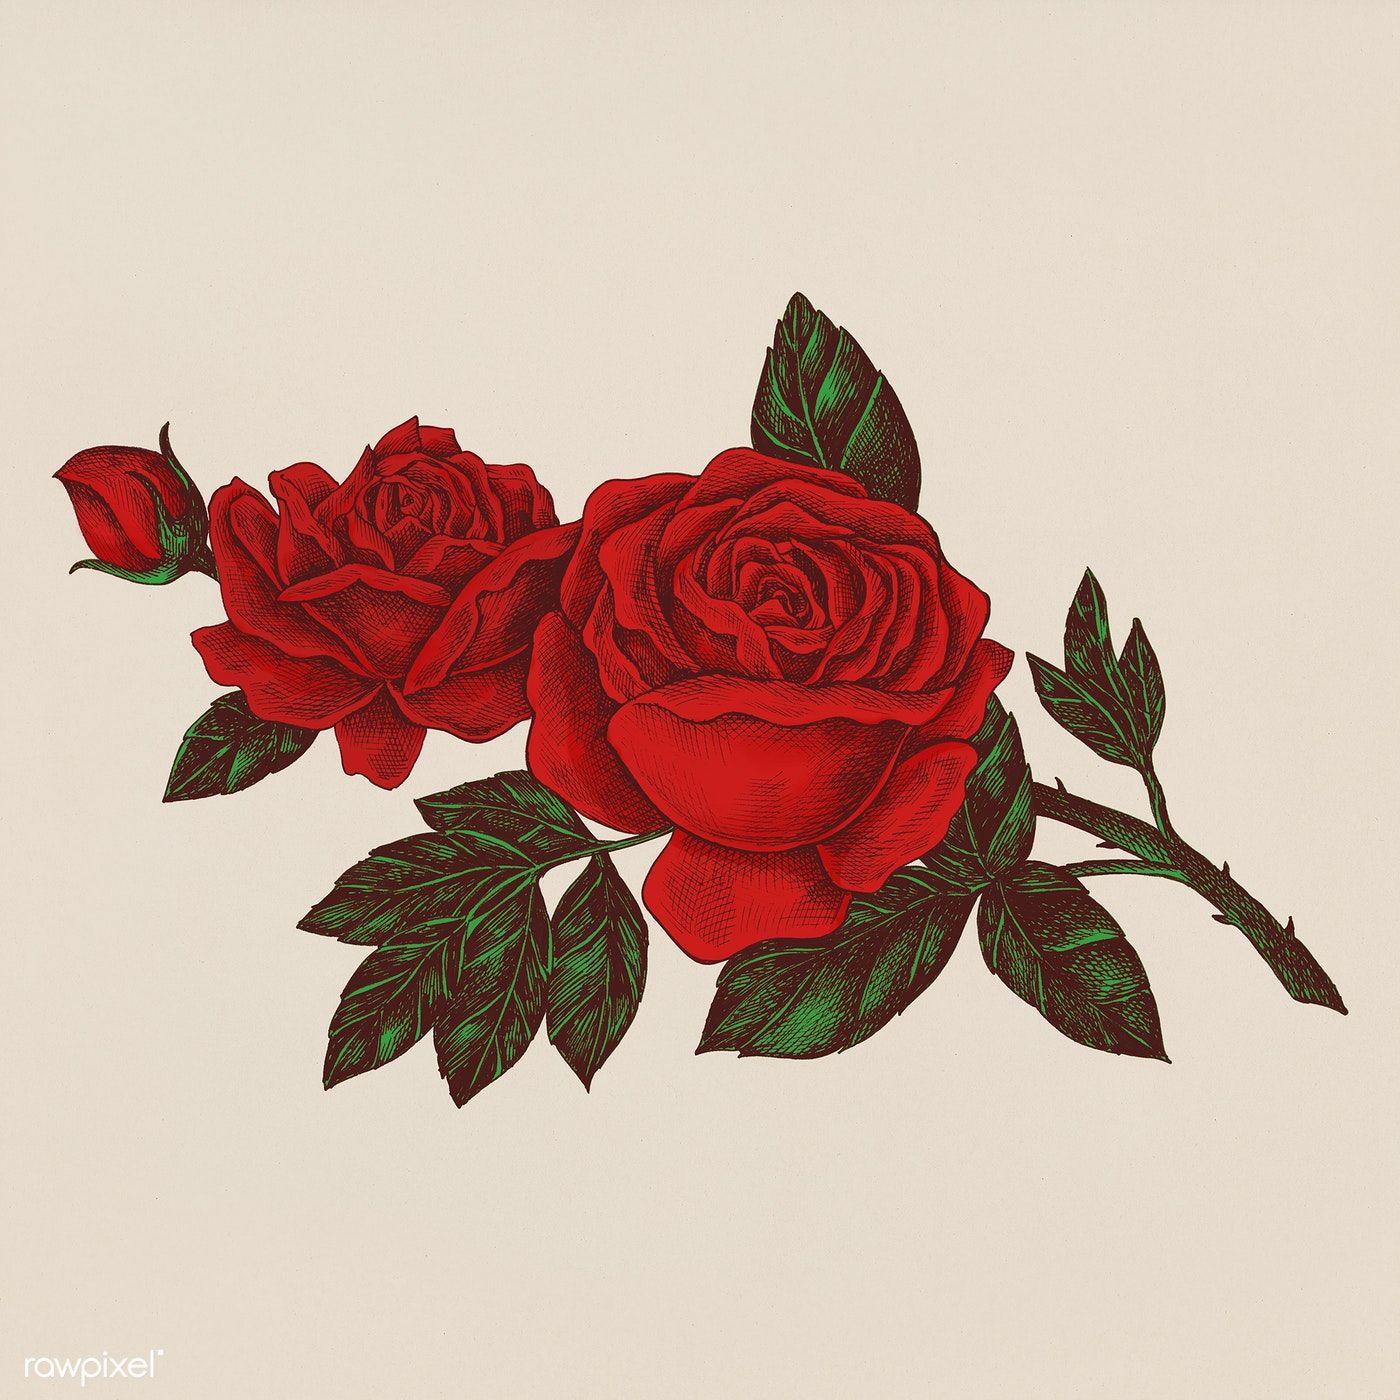 a44f851c56e744b33dcb8d56befa1d45 » Aesthetic Rose Drawing